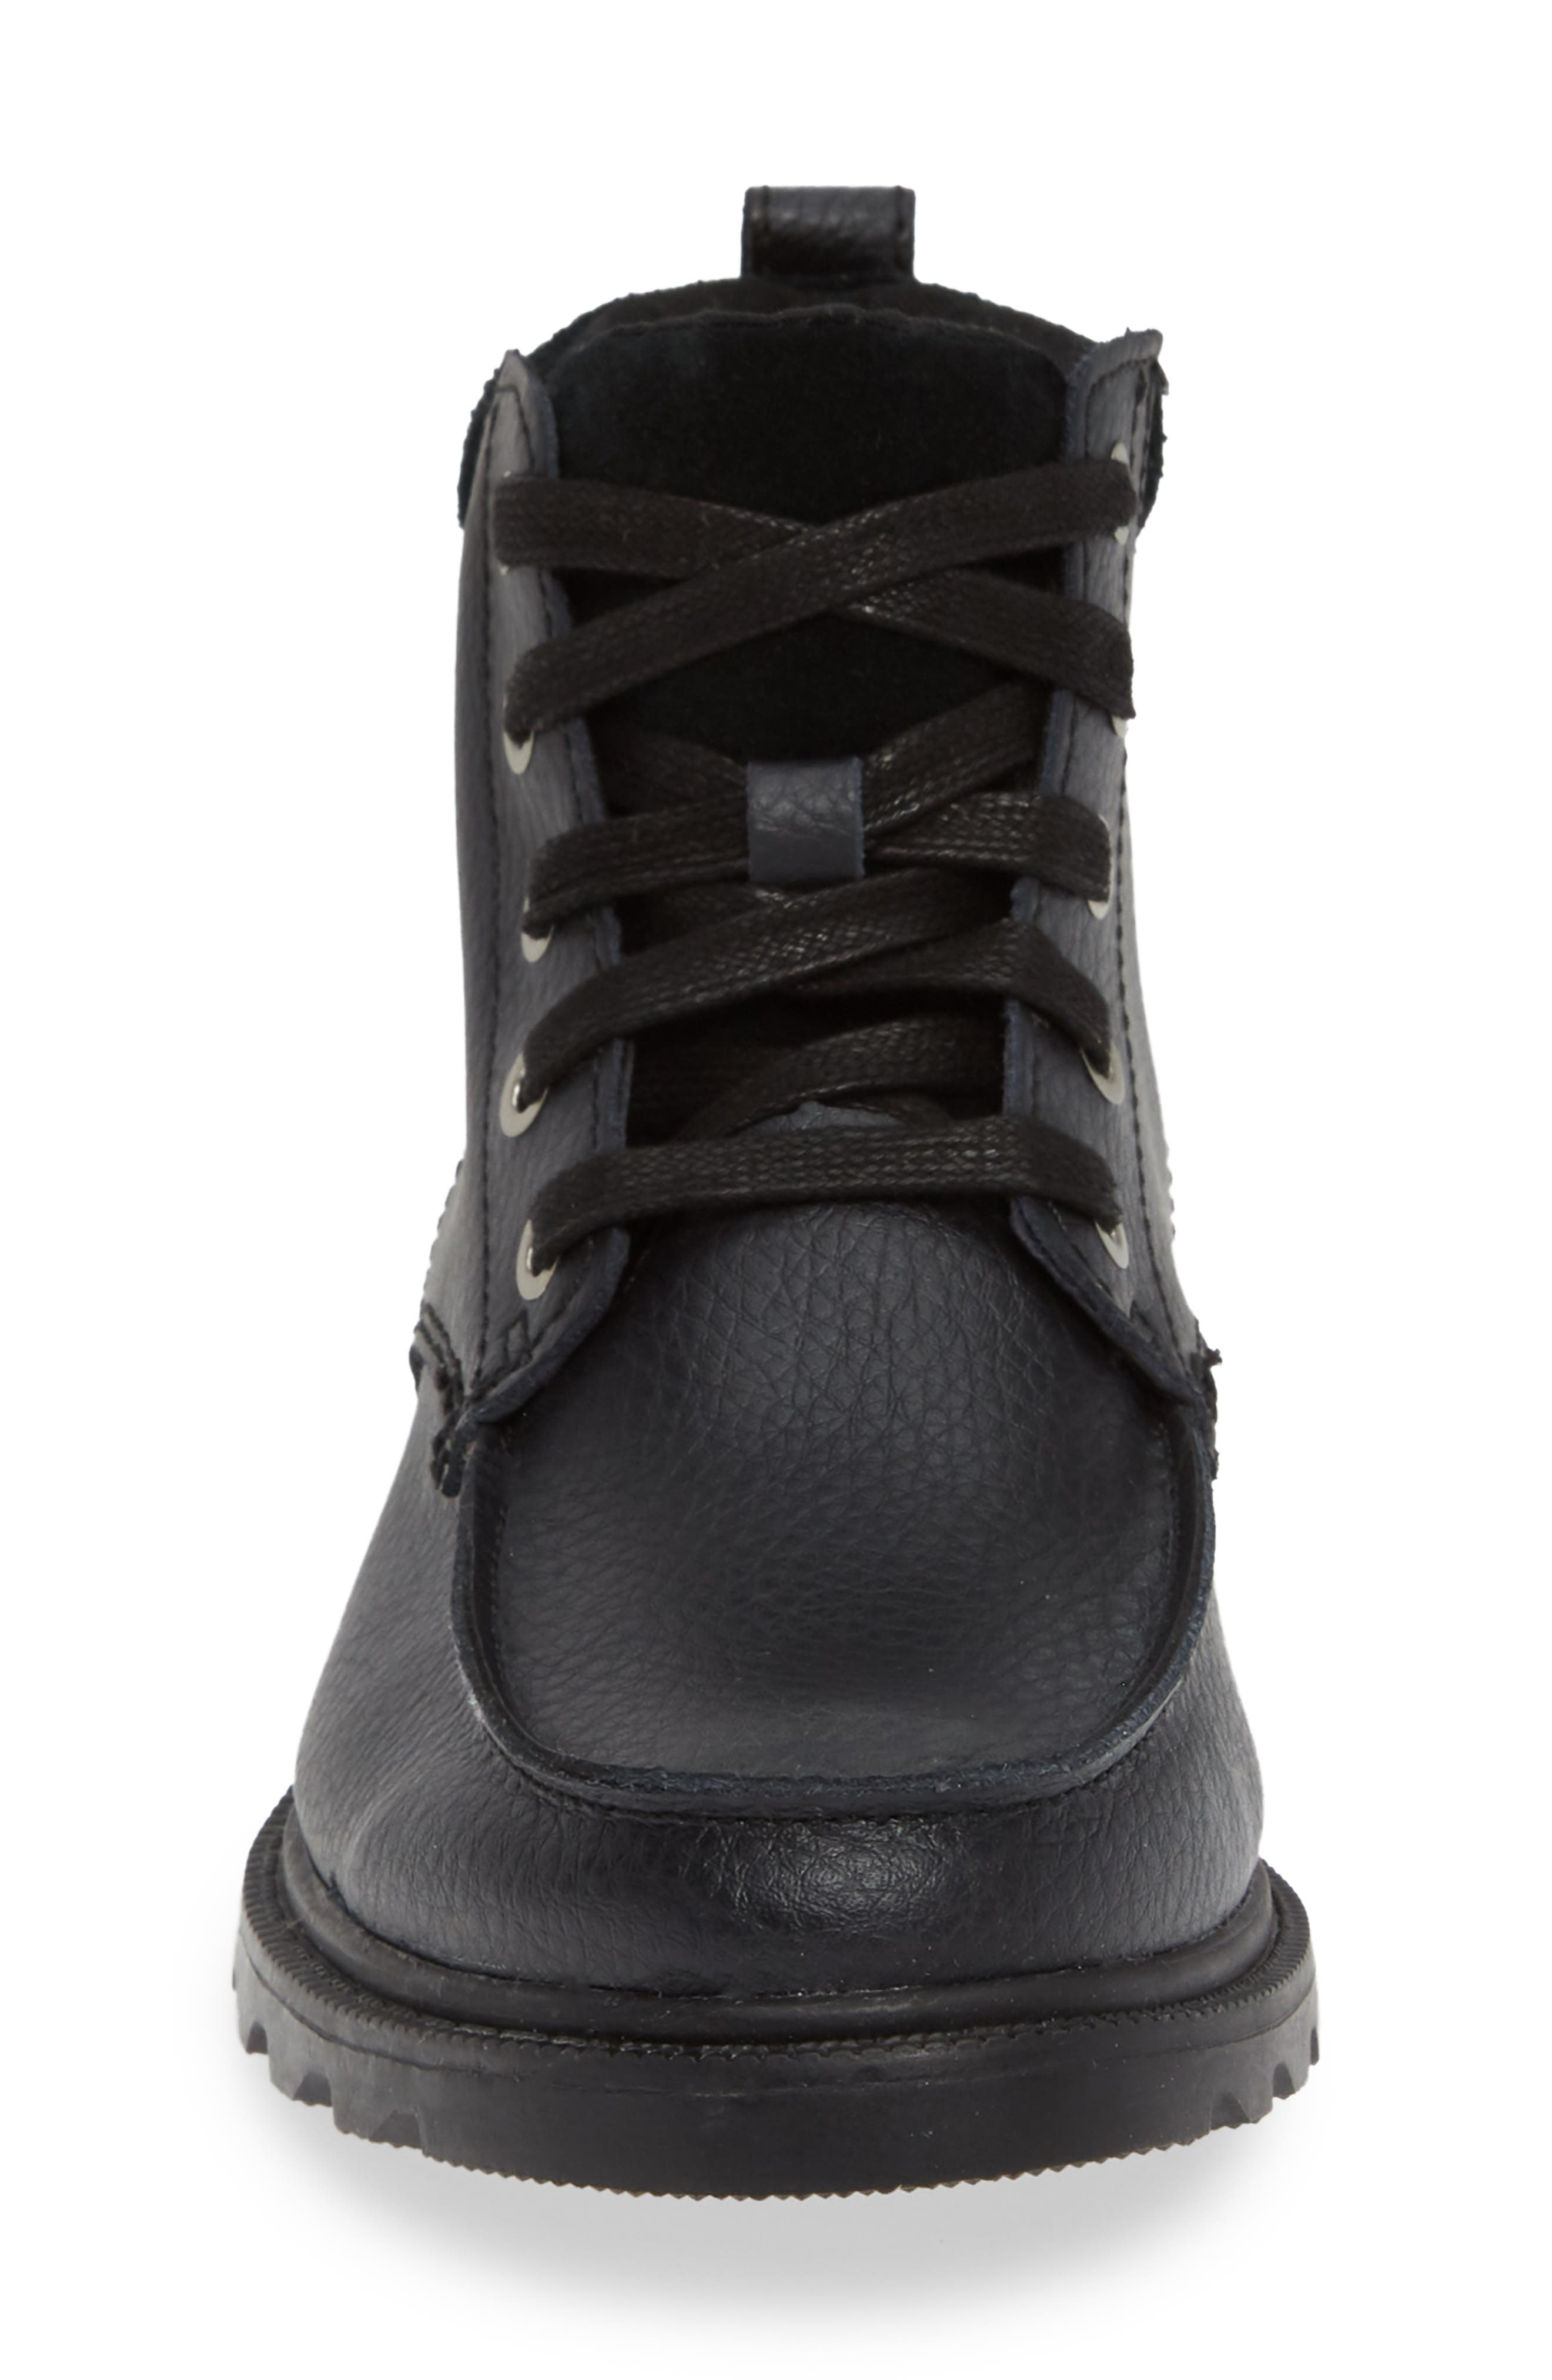 Madson Waterproof Moc Toe Boot,                             Alternate thumbnail 4, color,                             BLACK